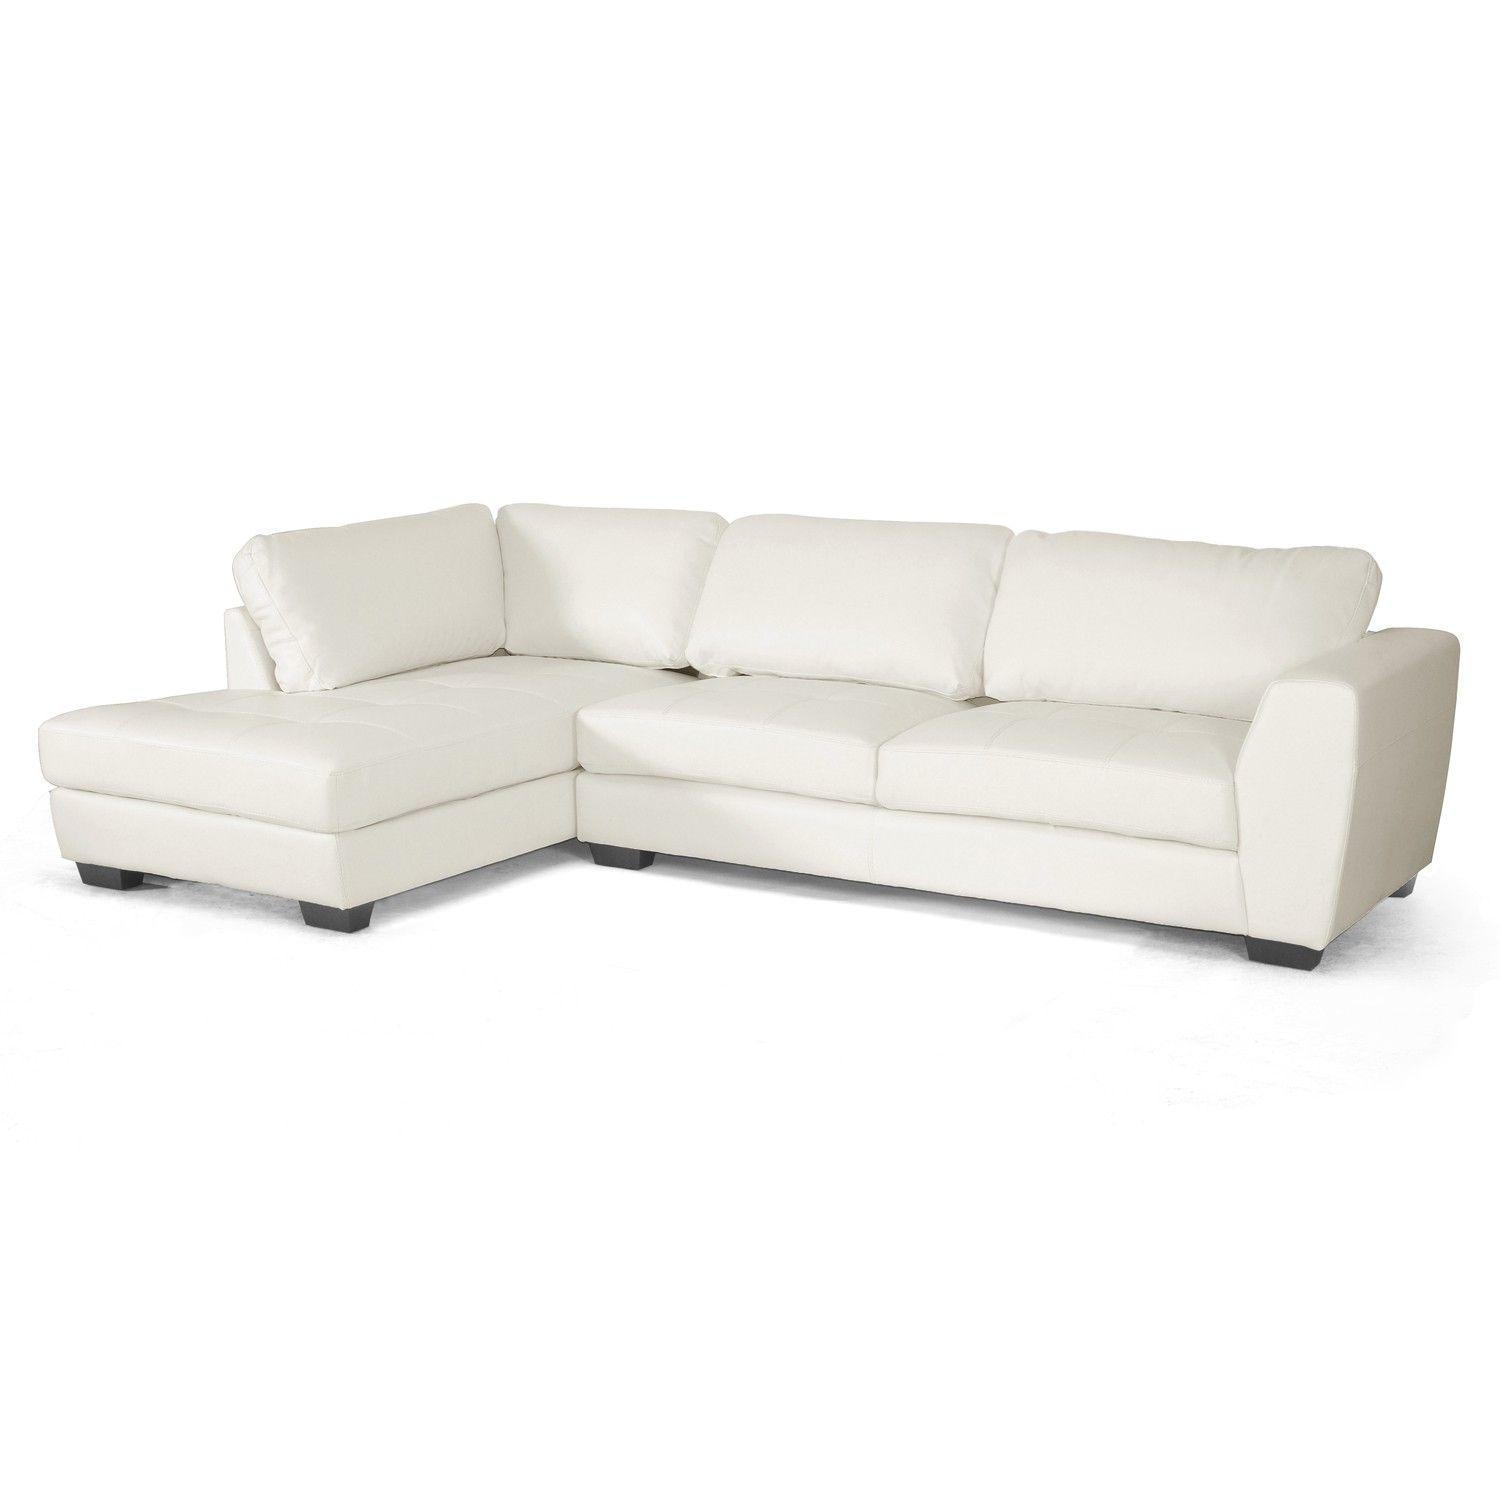 Baxton Studio Orland White Leather Modern Sectional Sofa Set With Left  Facingu2026